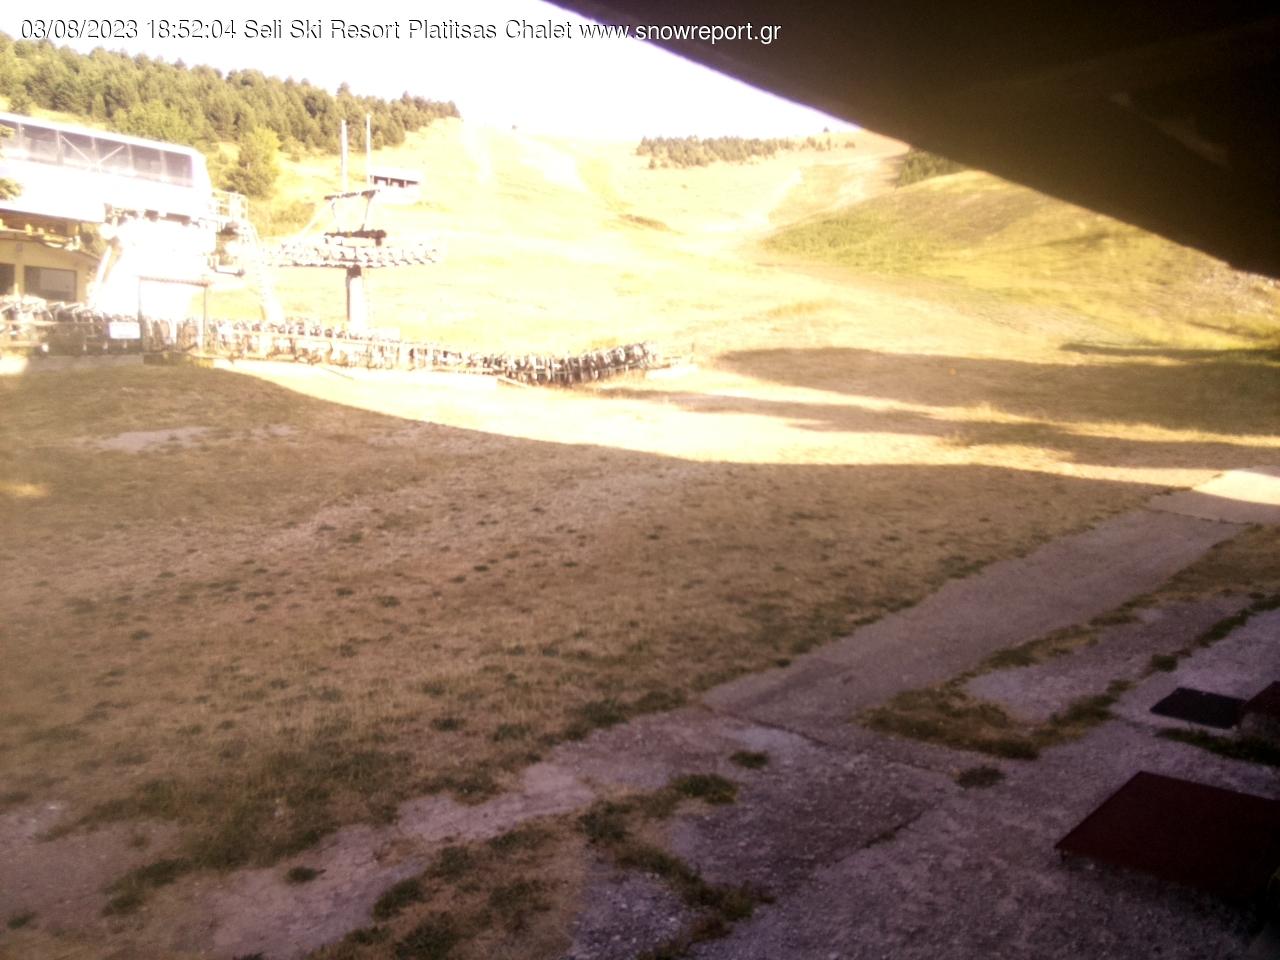 Webcam Σέλι Χιονοδρομικό Κέντρο